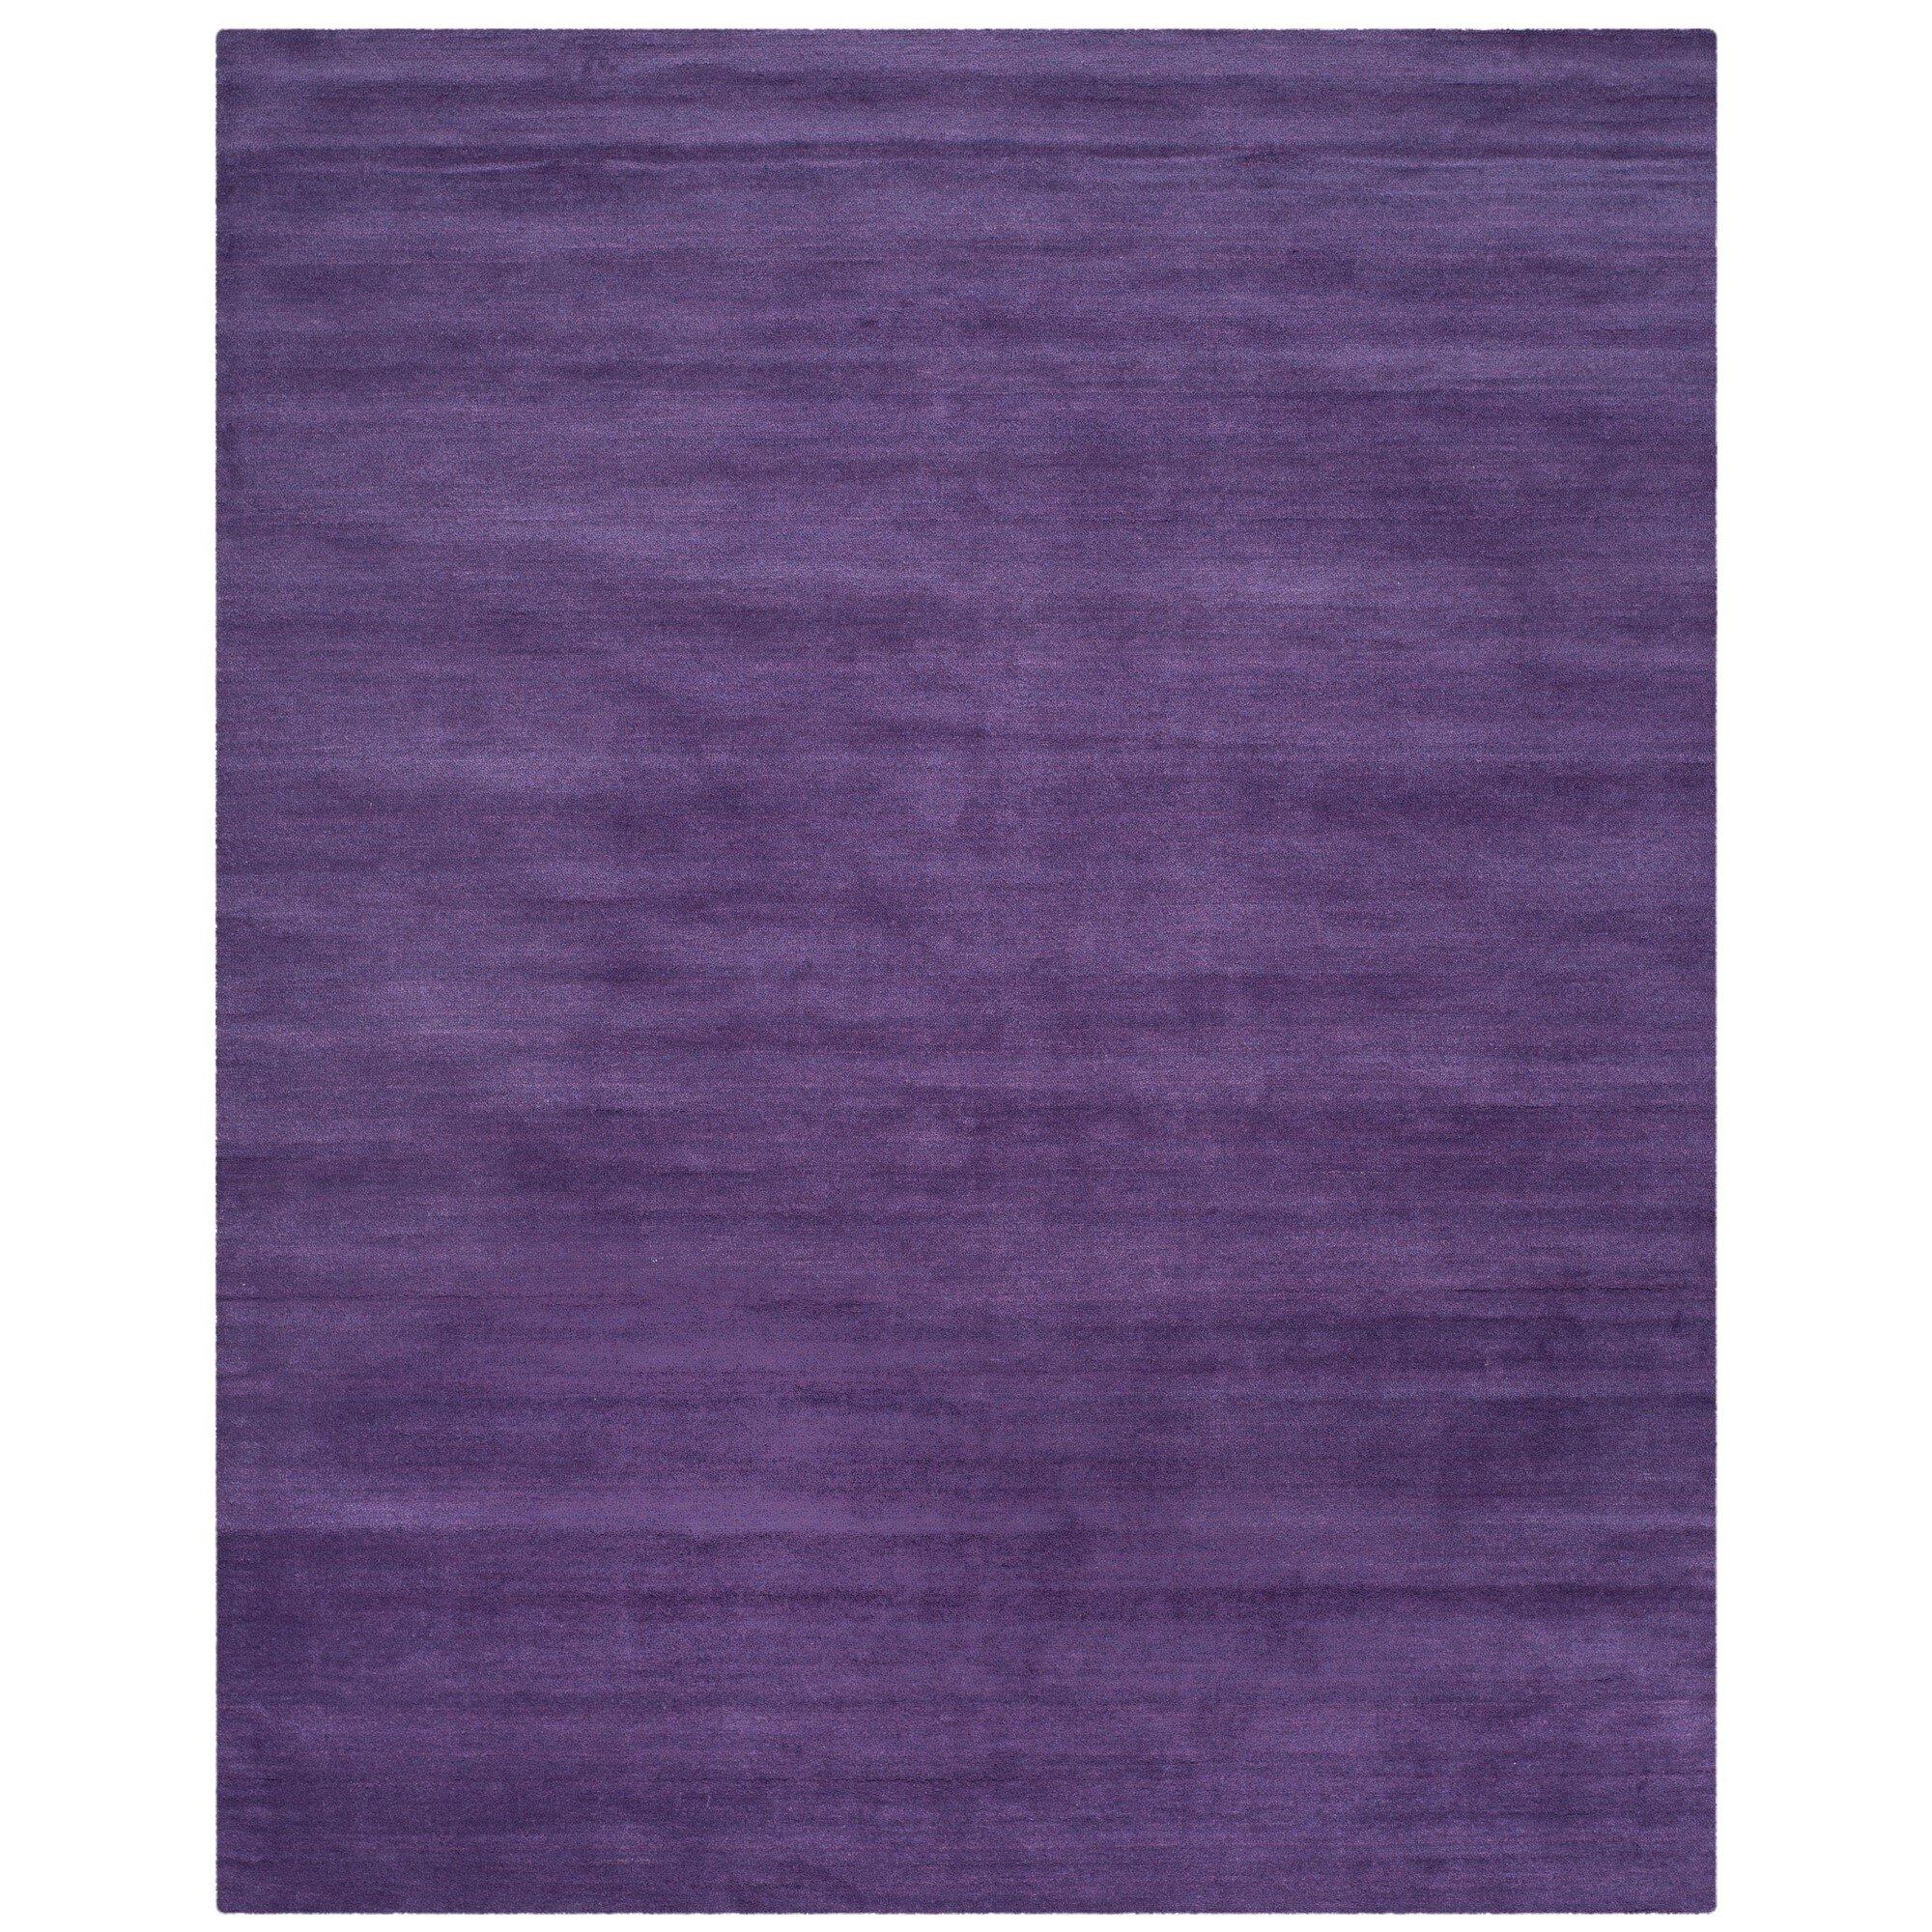 Luxury Purple Area Rugs Perigold